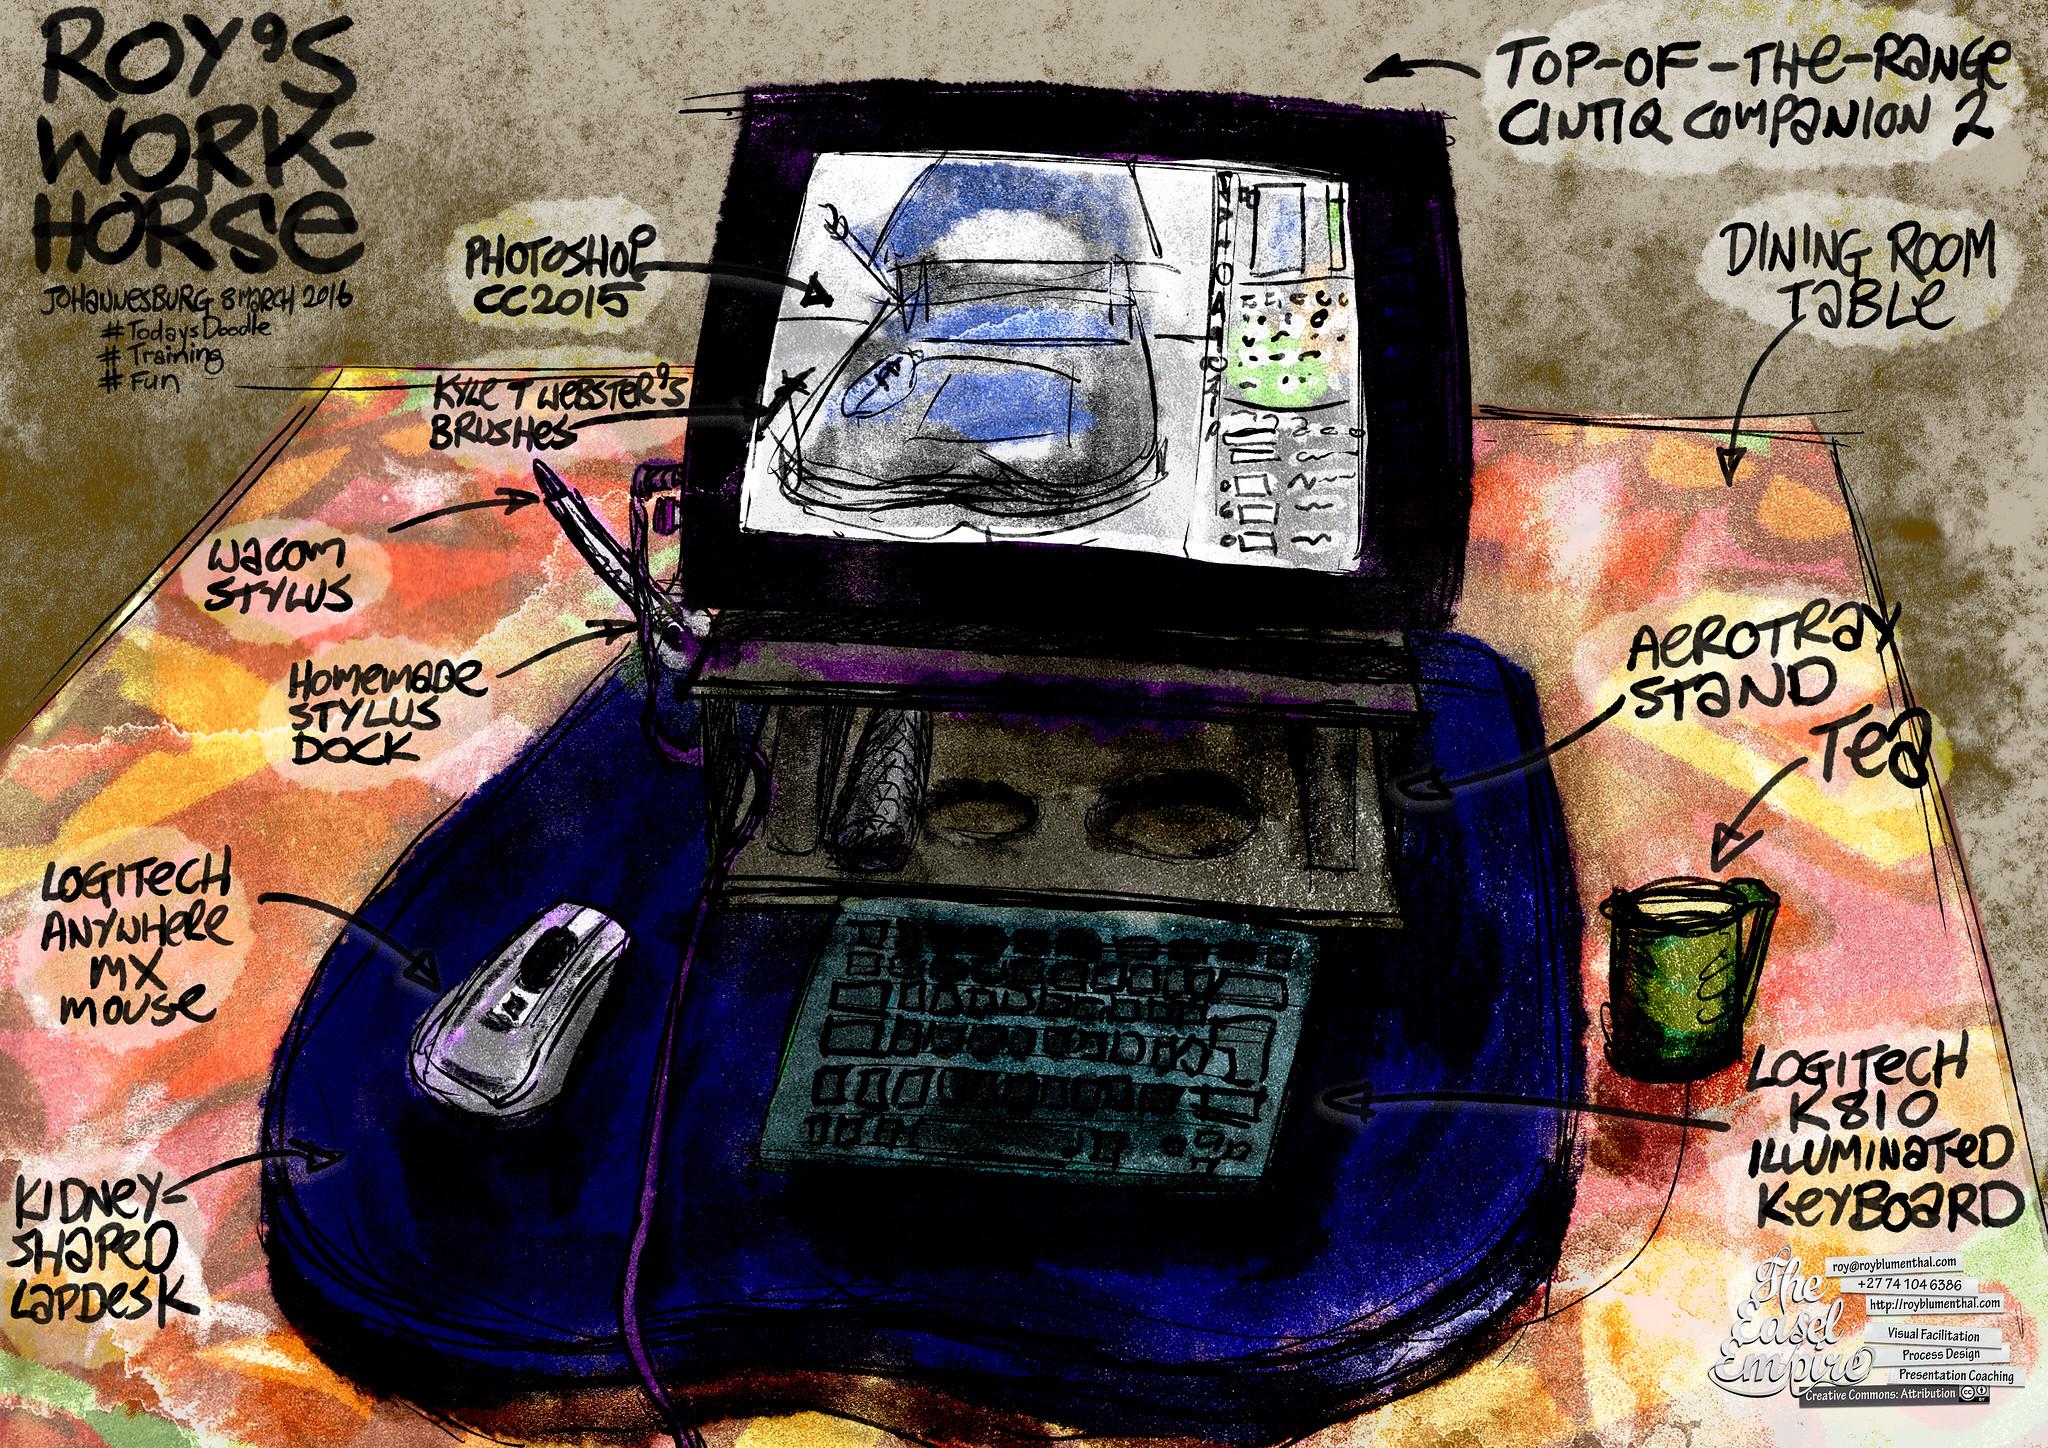 The technological powerhouse behind my digital artmaking